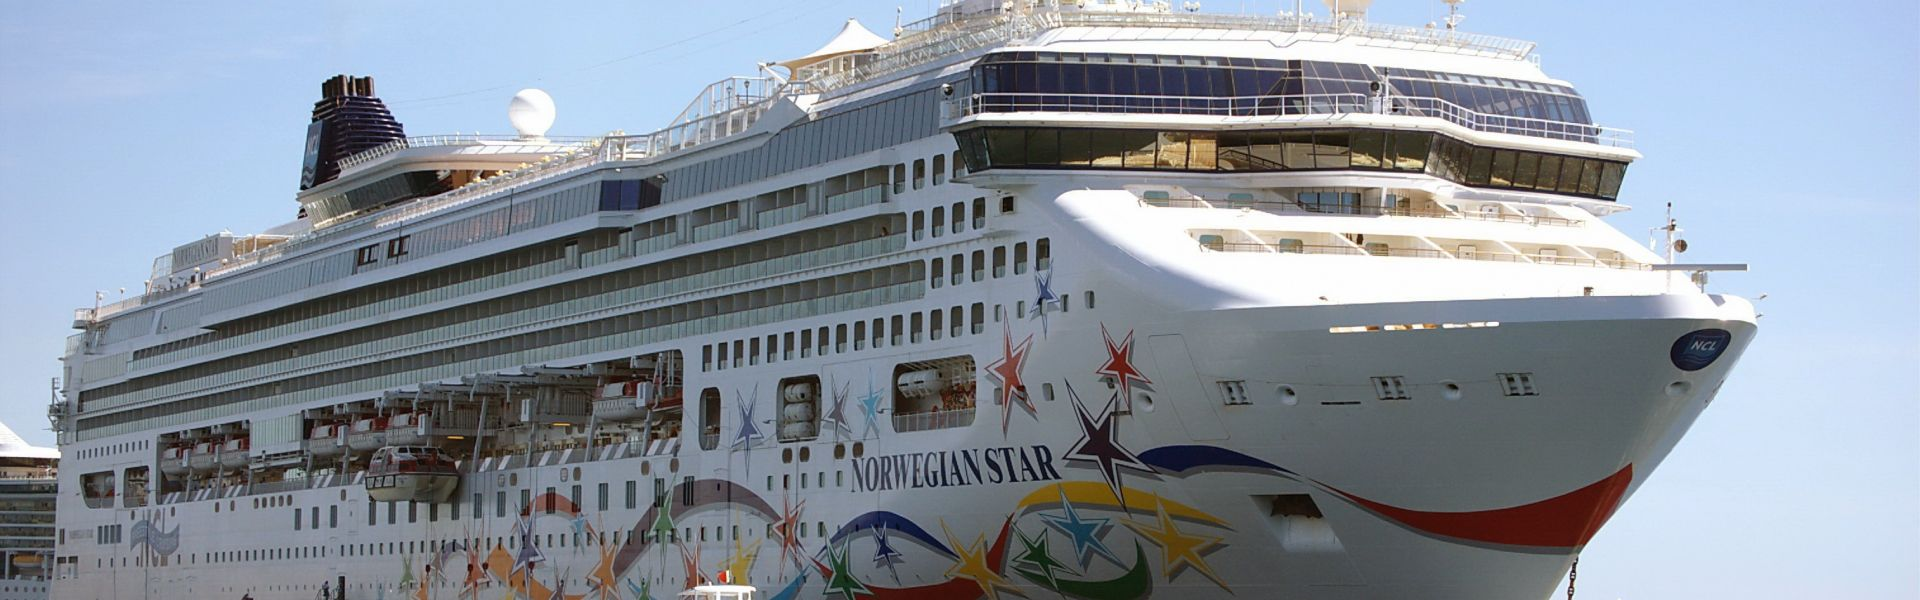 Croaziera 2017 - Riviera Mexicana (Los Angeles) - Norwegian Cruise Line - Norwegian Star - 7 nopti